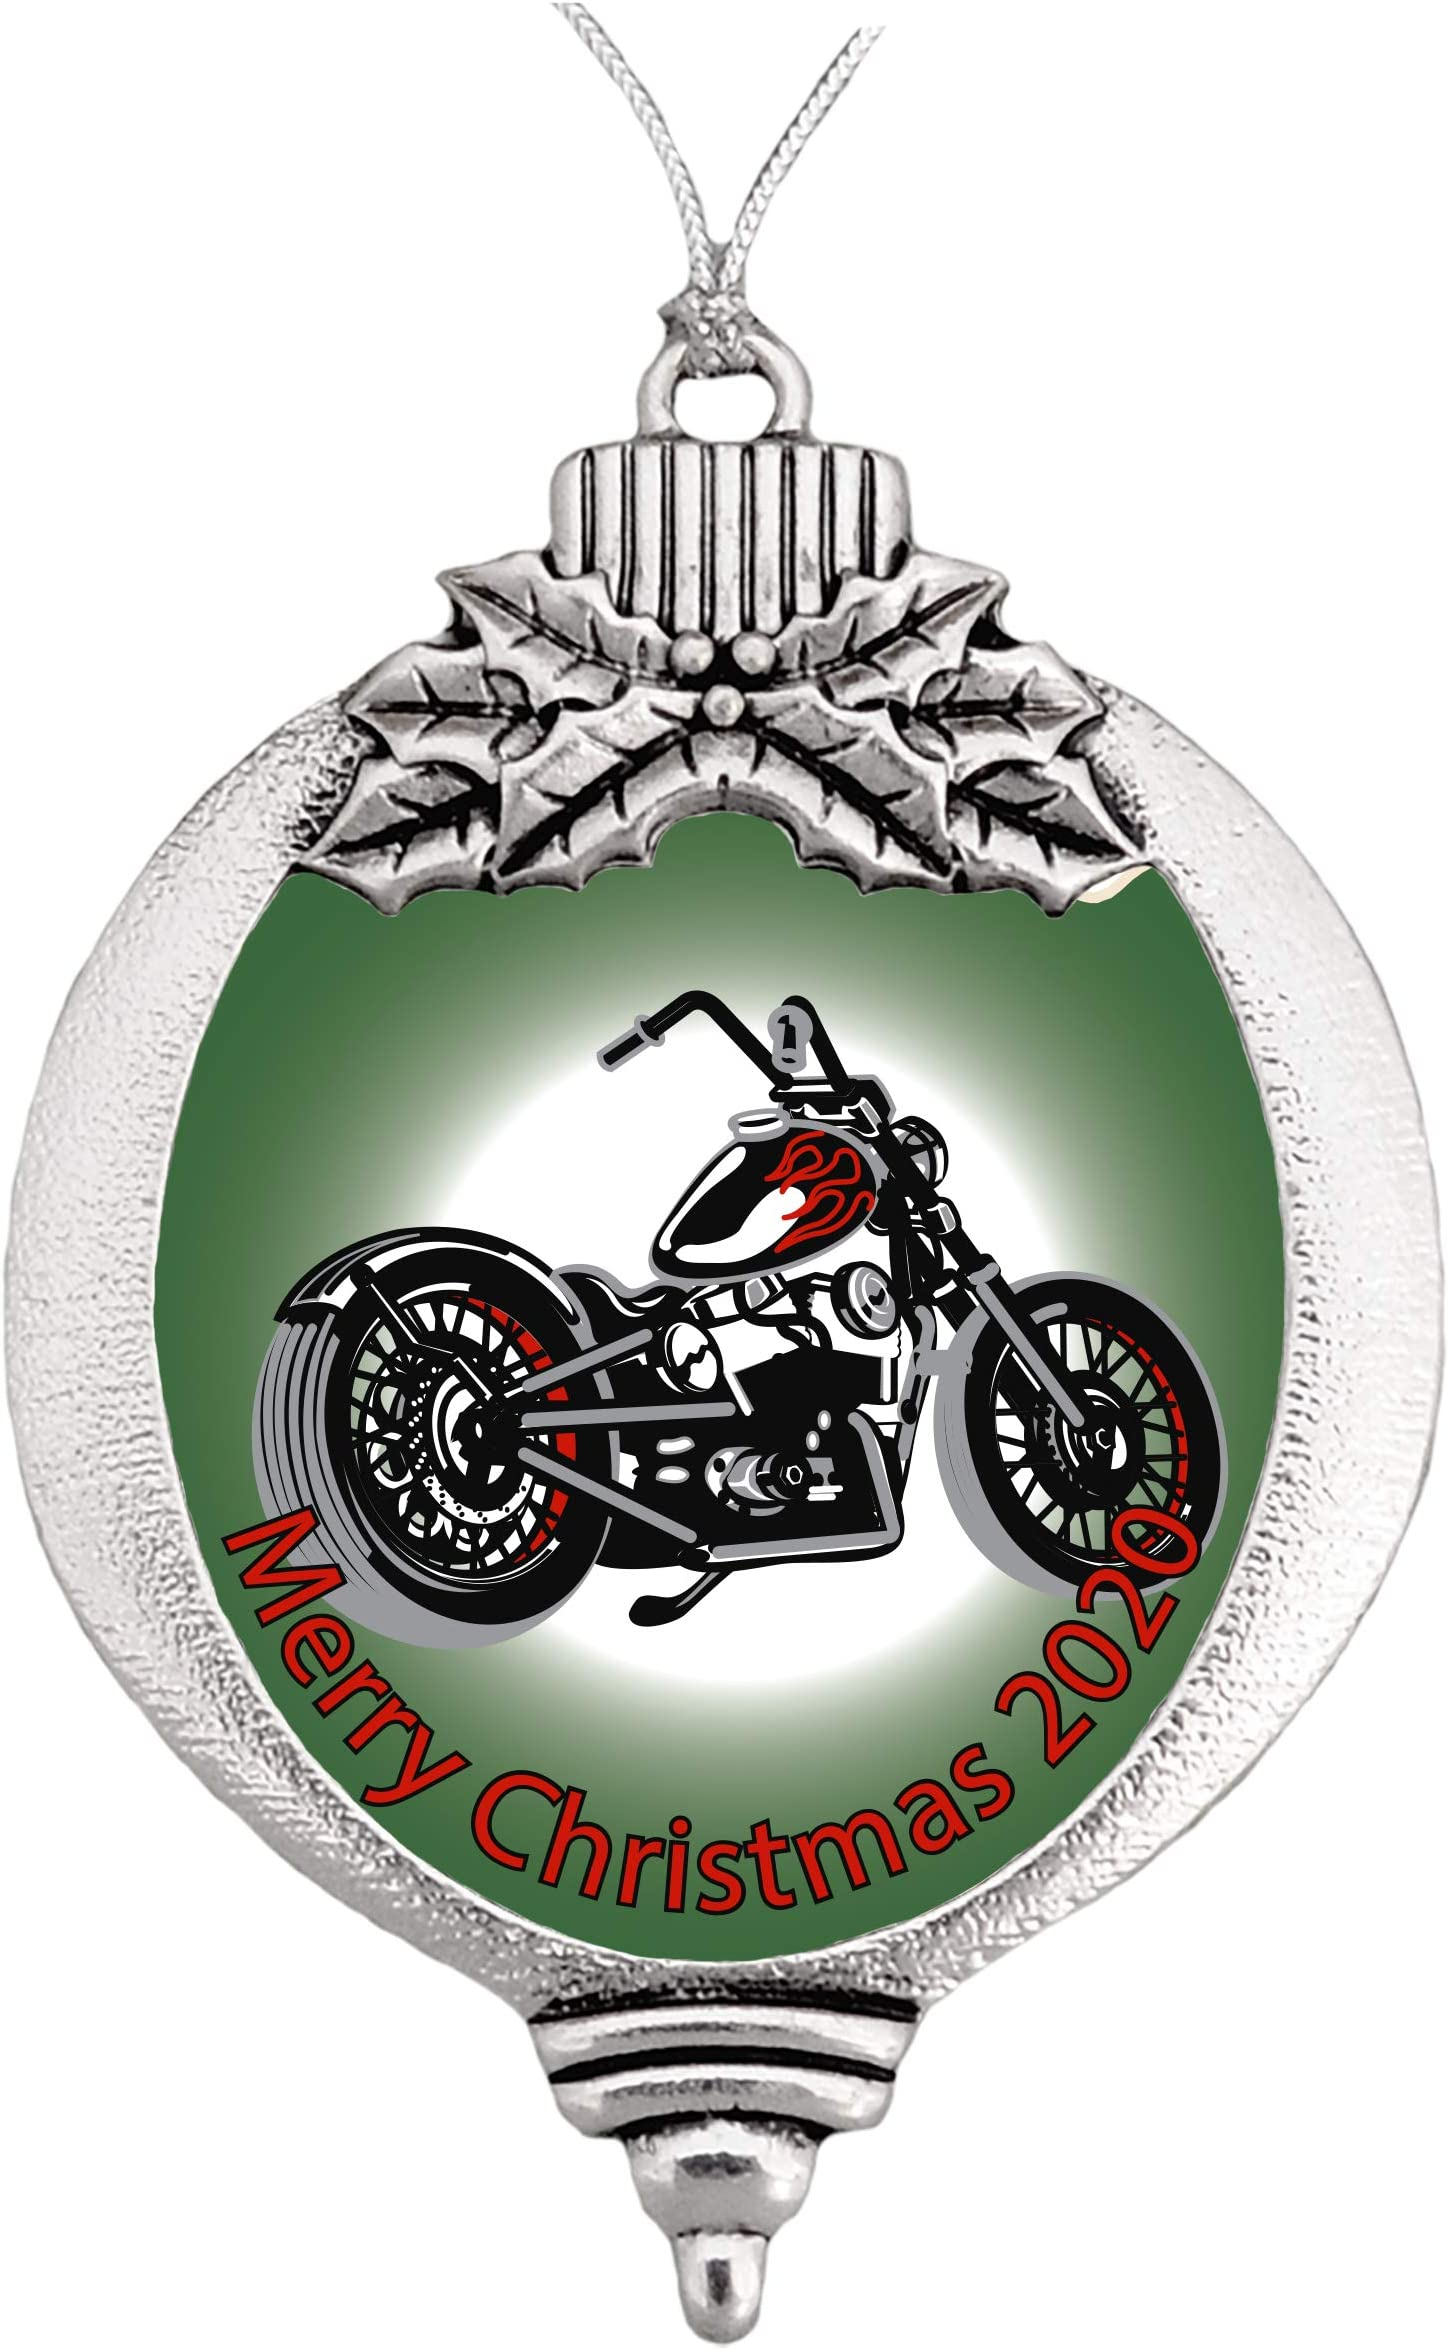 Harley Davidson 105th Anniversary Rare White 2008 Christmas Ball Bulb Ornament